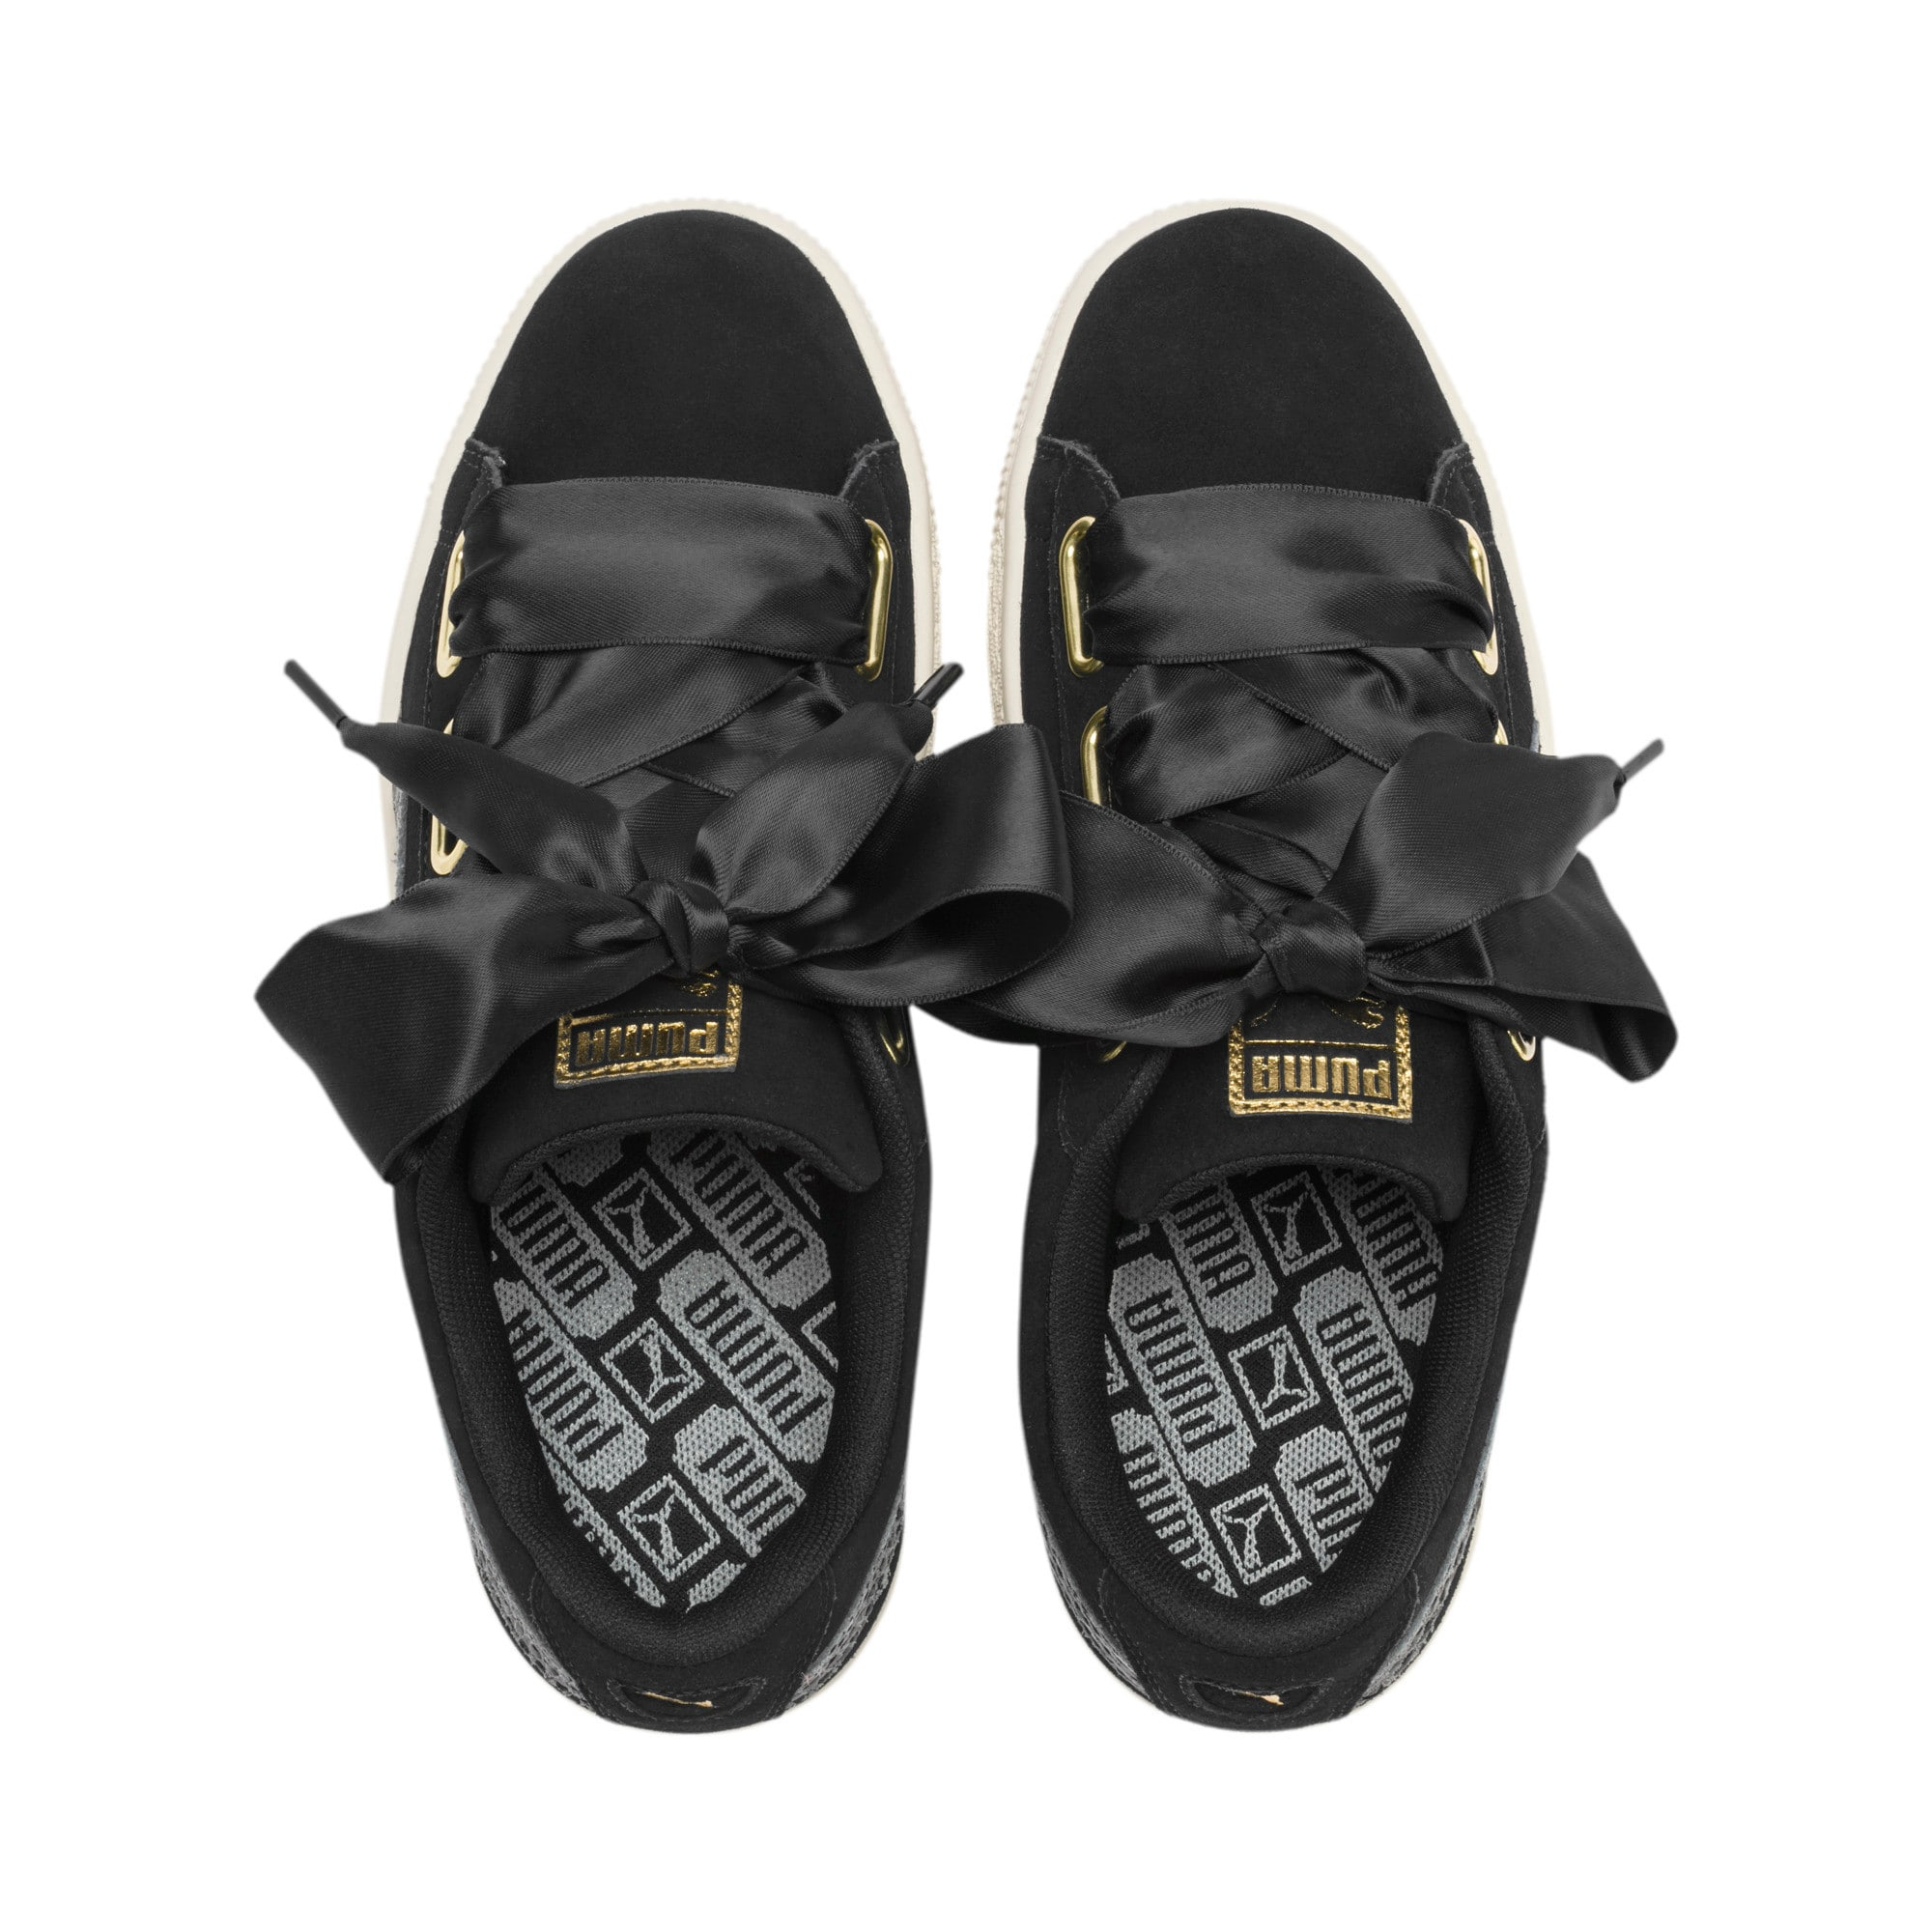 Thumbnail 7 of Suede Heart Snake Lux Women's Sneakers, Puma Black-Puma Team Gold, medium